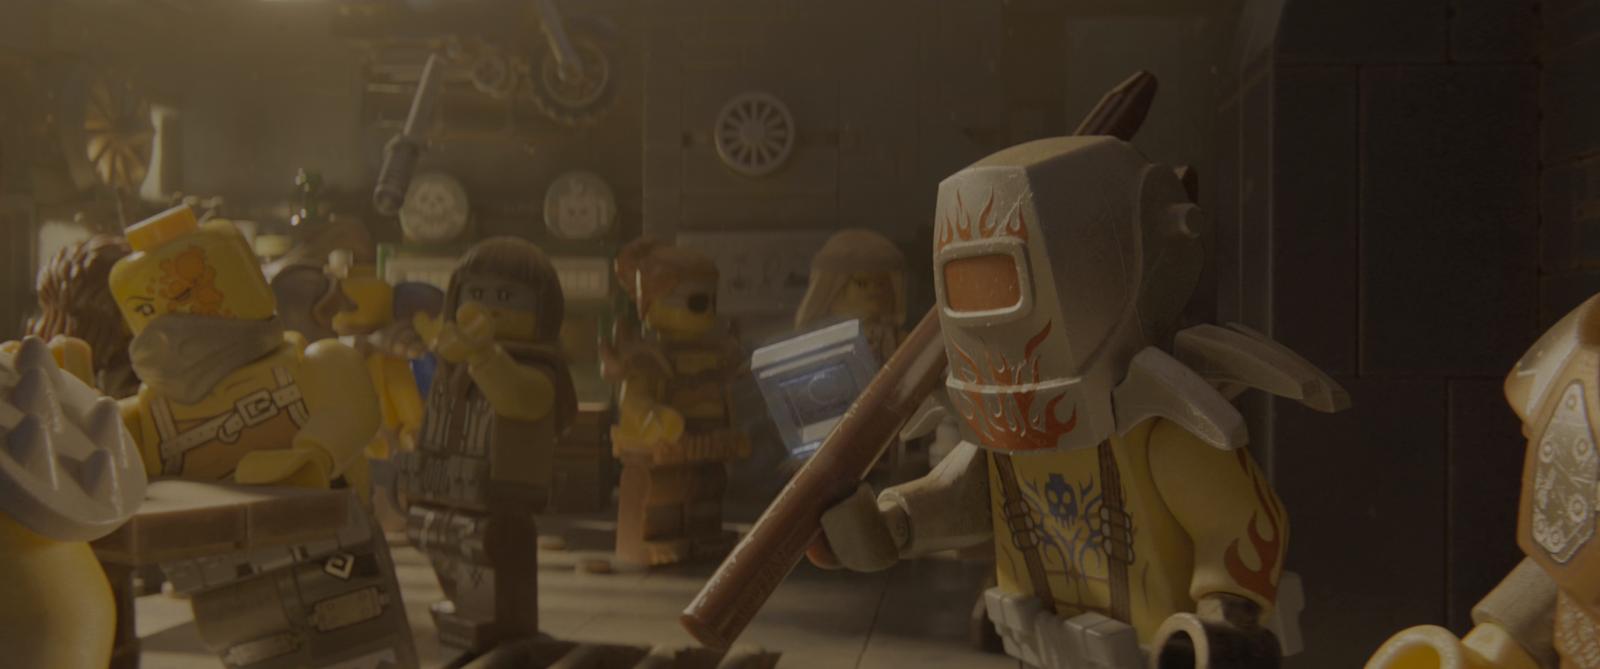 La gran aventura LEGO 2 (2019) 4K UHD HDR Latino